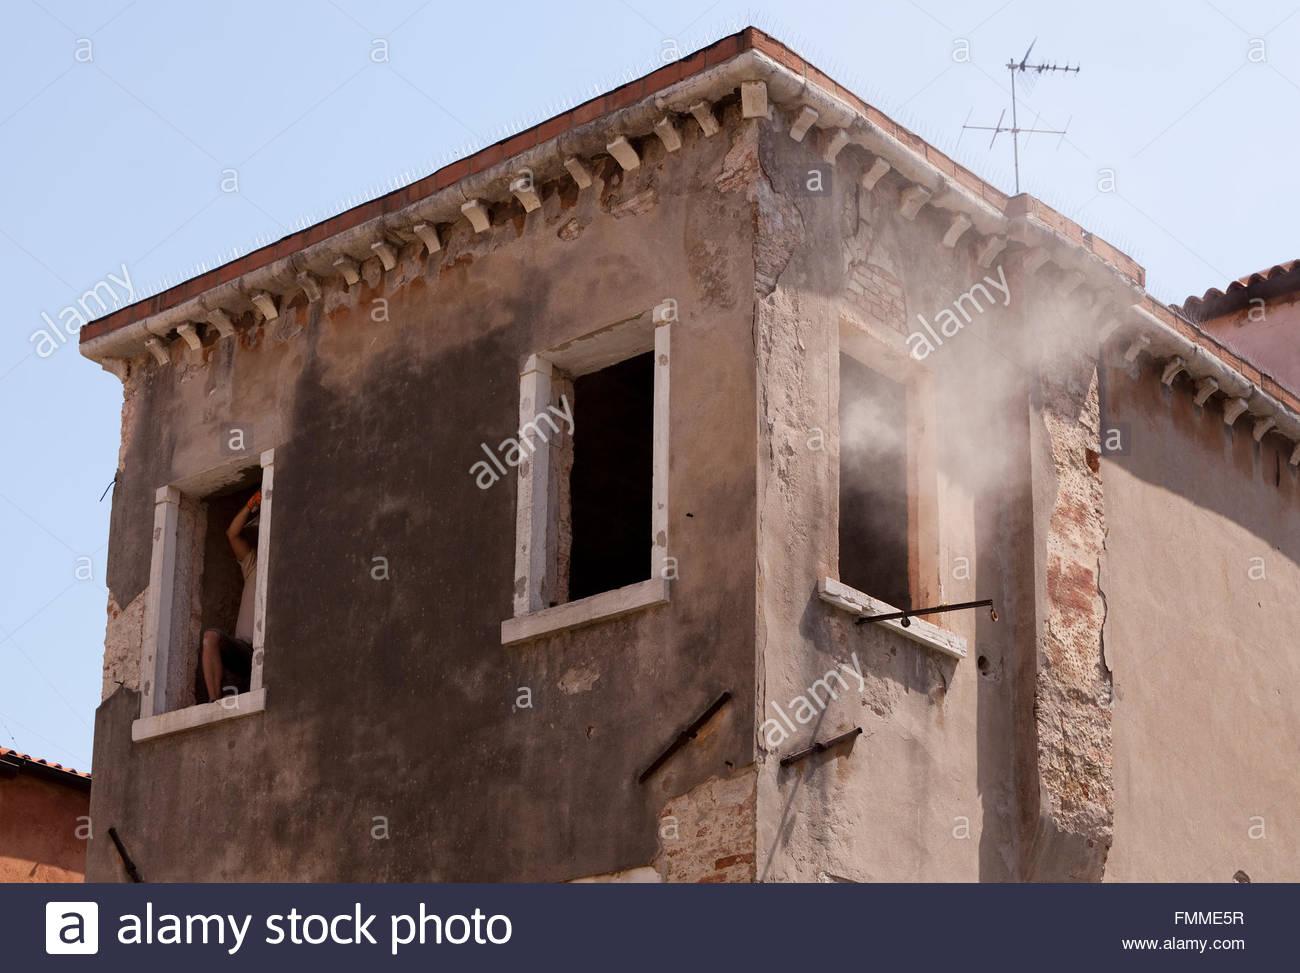 Dusty work in Venice - Stock Image